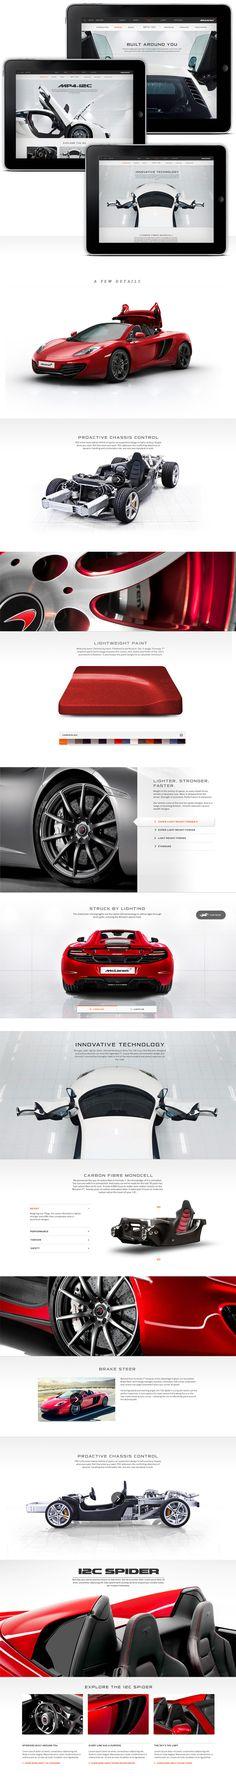 McLaren Automotive Website by Thomas Moeller, via Behance | Web ...